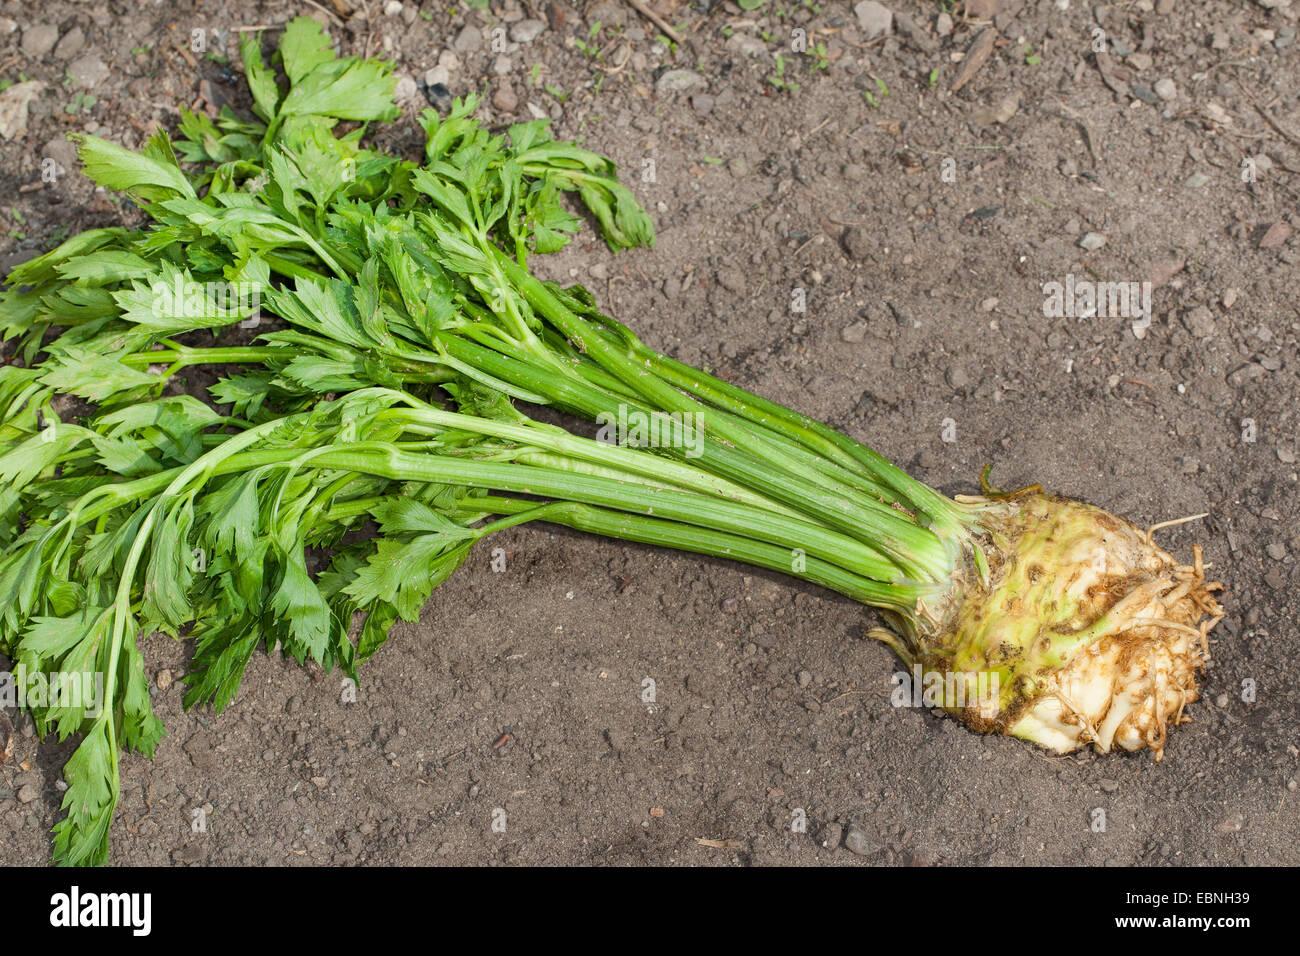 Il sedano rapa, Rapa sedano, manopola (sedano Apium graveolens var. rapaceum, Apium graveolens rapaceum, Apium rapaceum), Immagini Stock